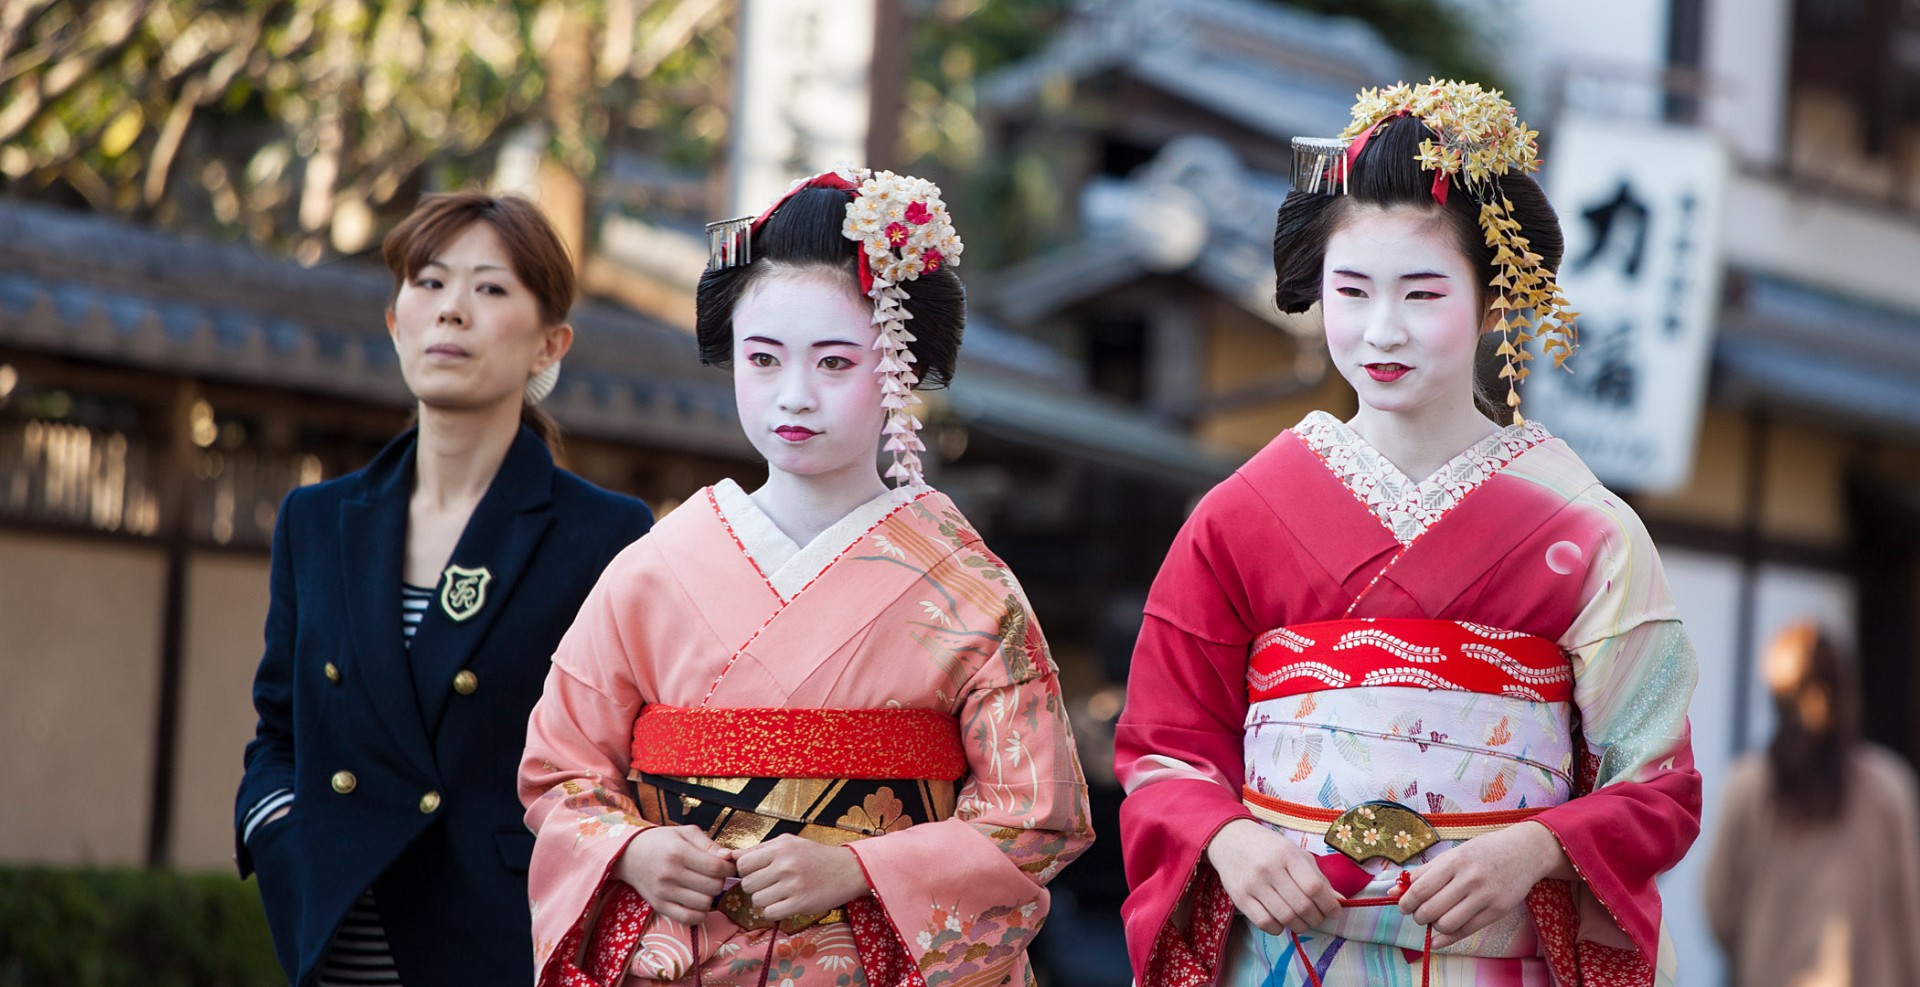 Reportage-Fotograf-in-Paris-Reportage-Fotografie-Japanerinnen